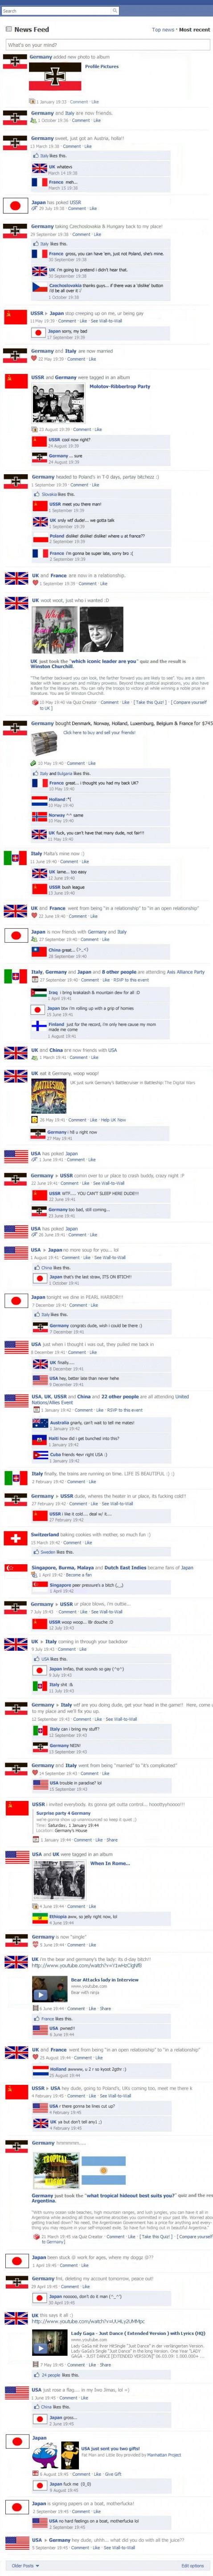 II. világháború története facebookosítva